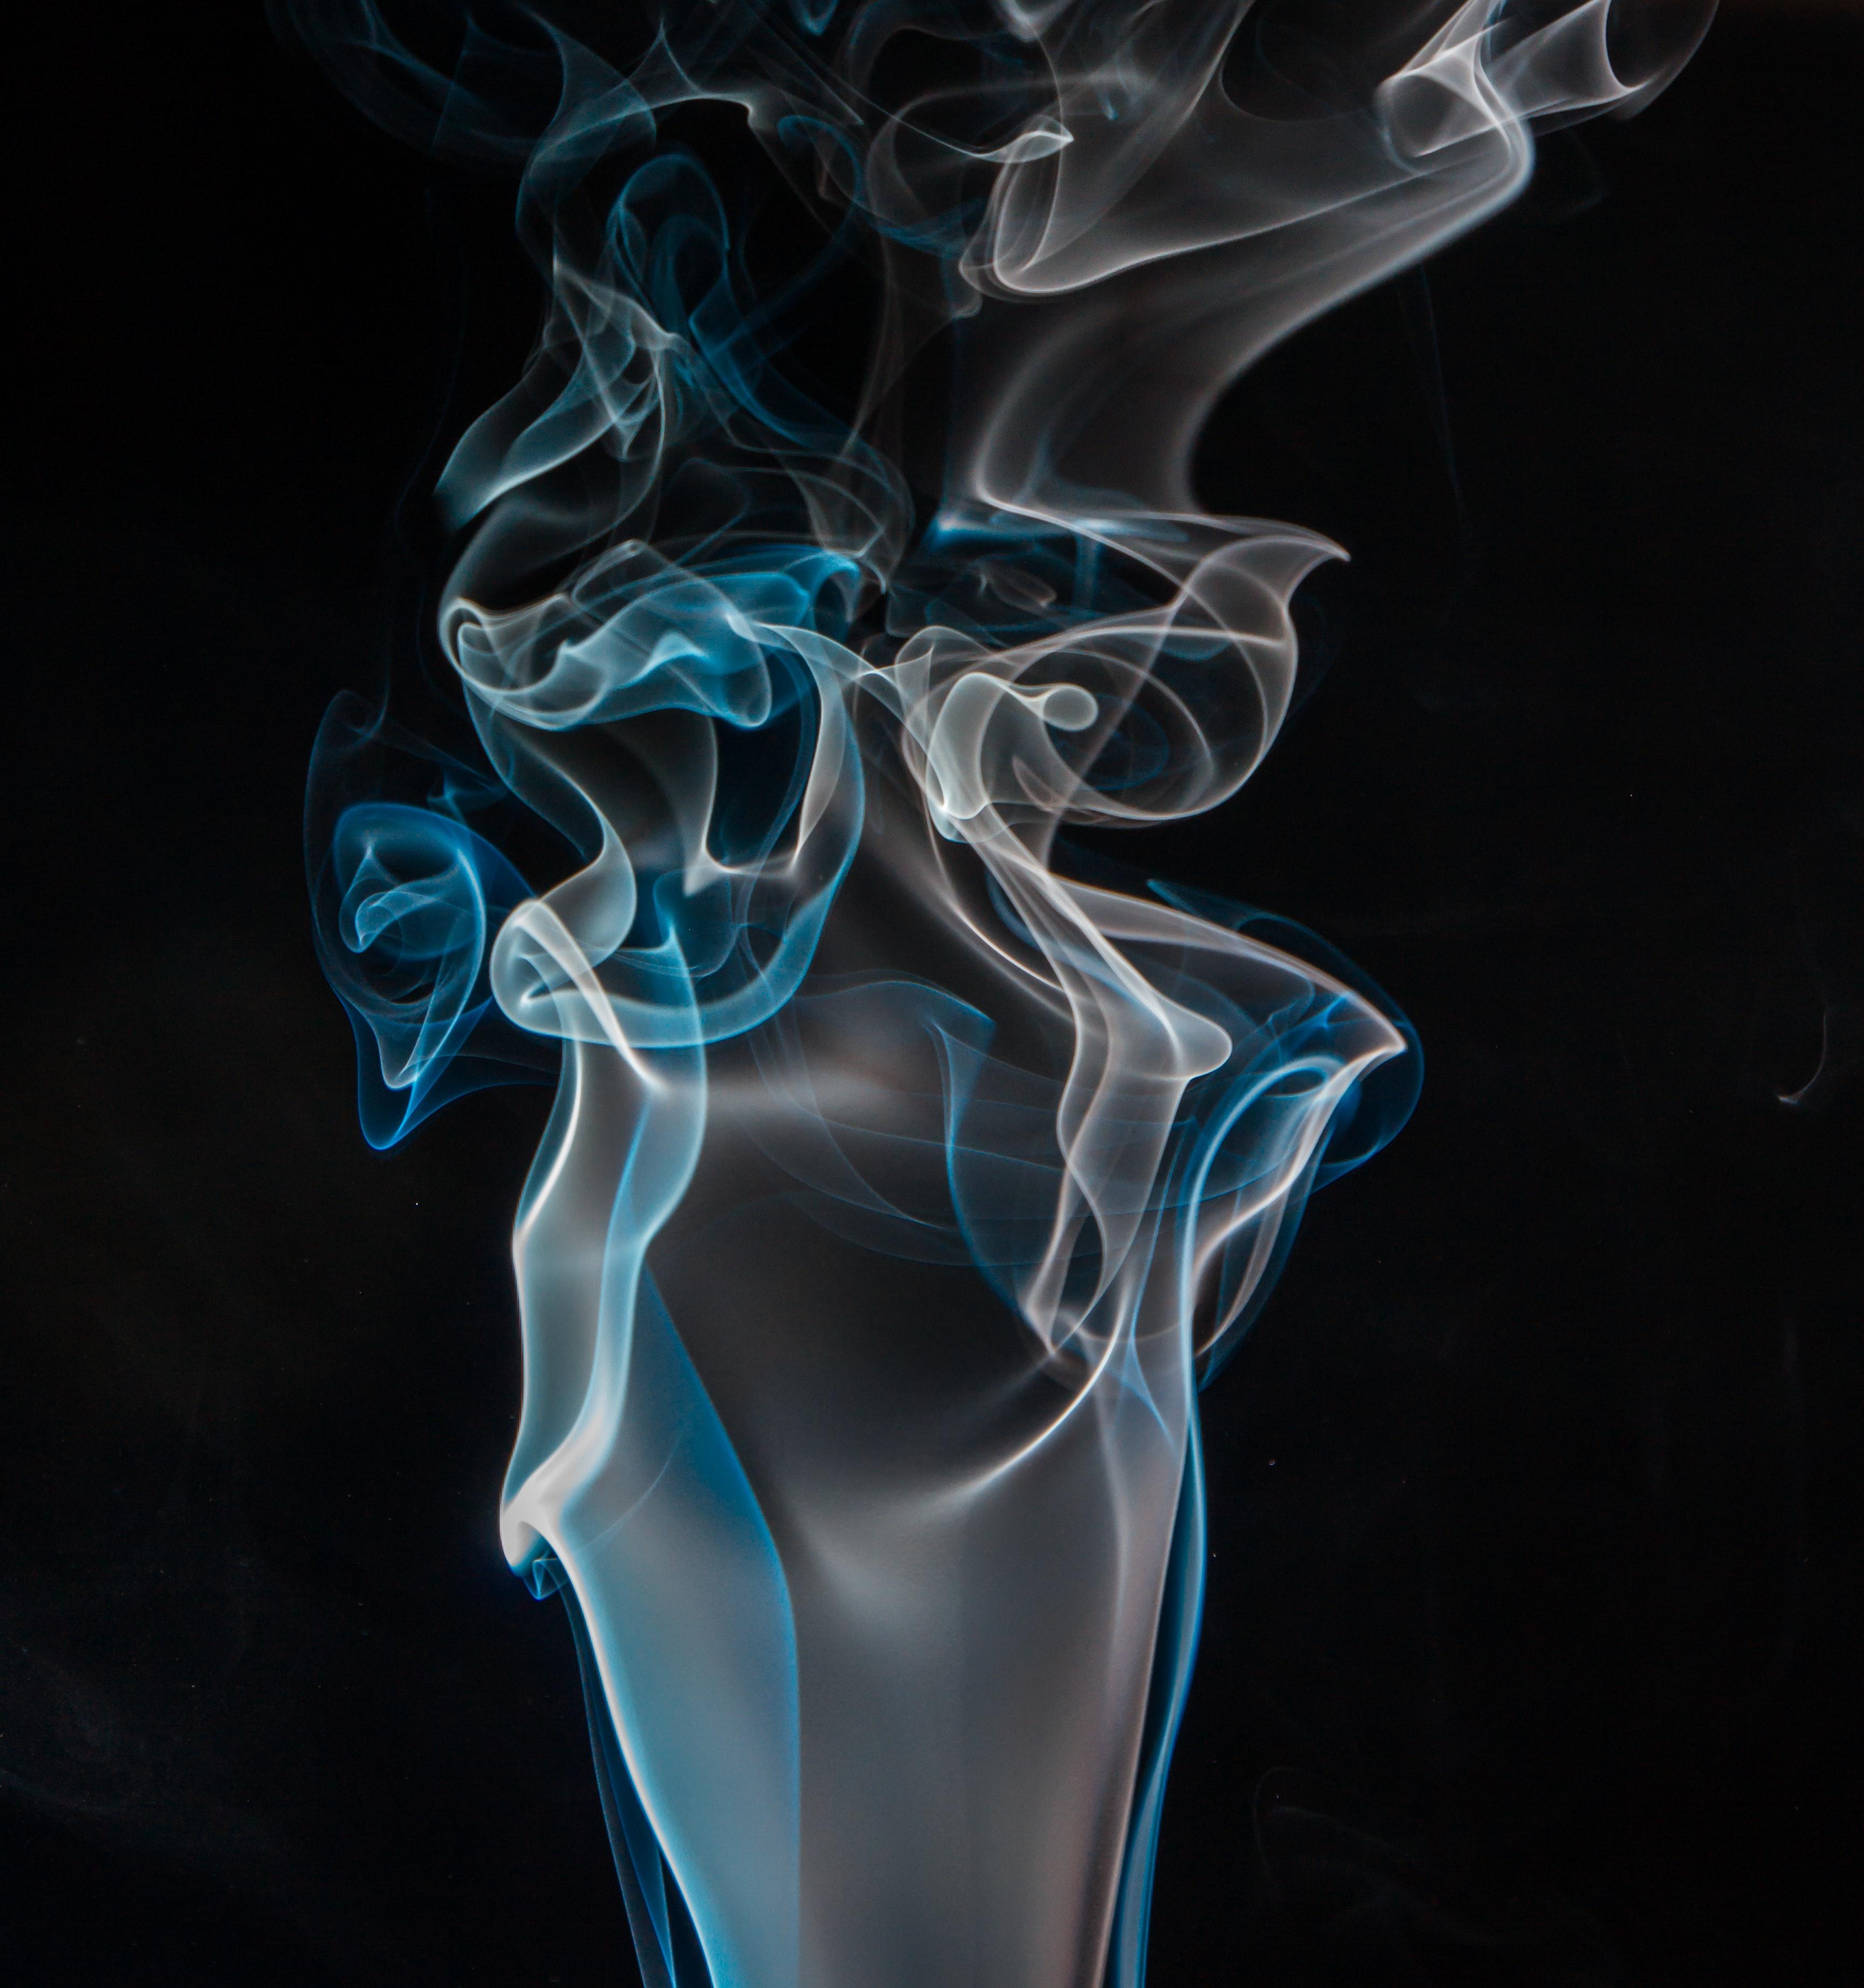 Smoke iphone s for parallax wallpapers hd desktop